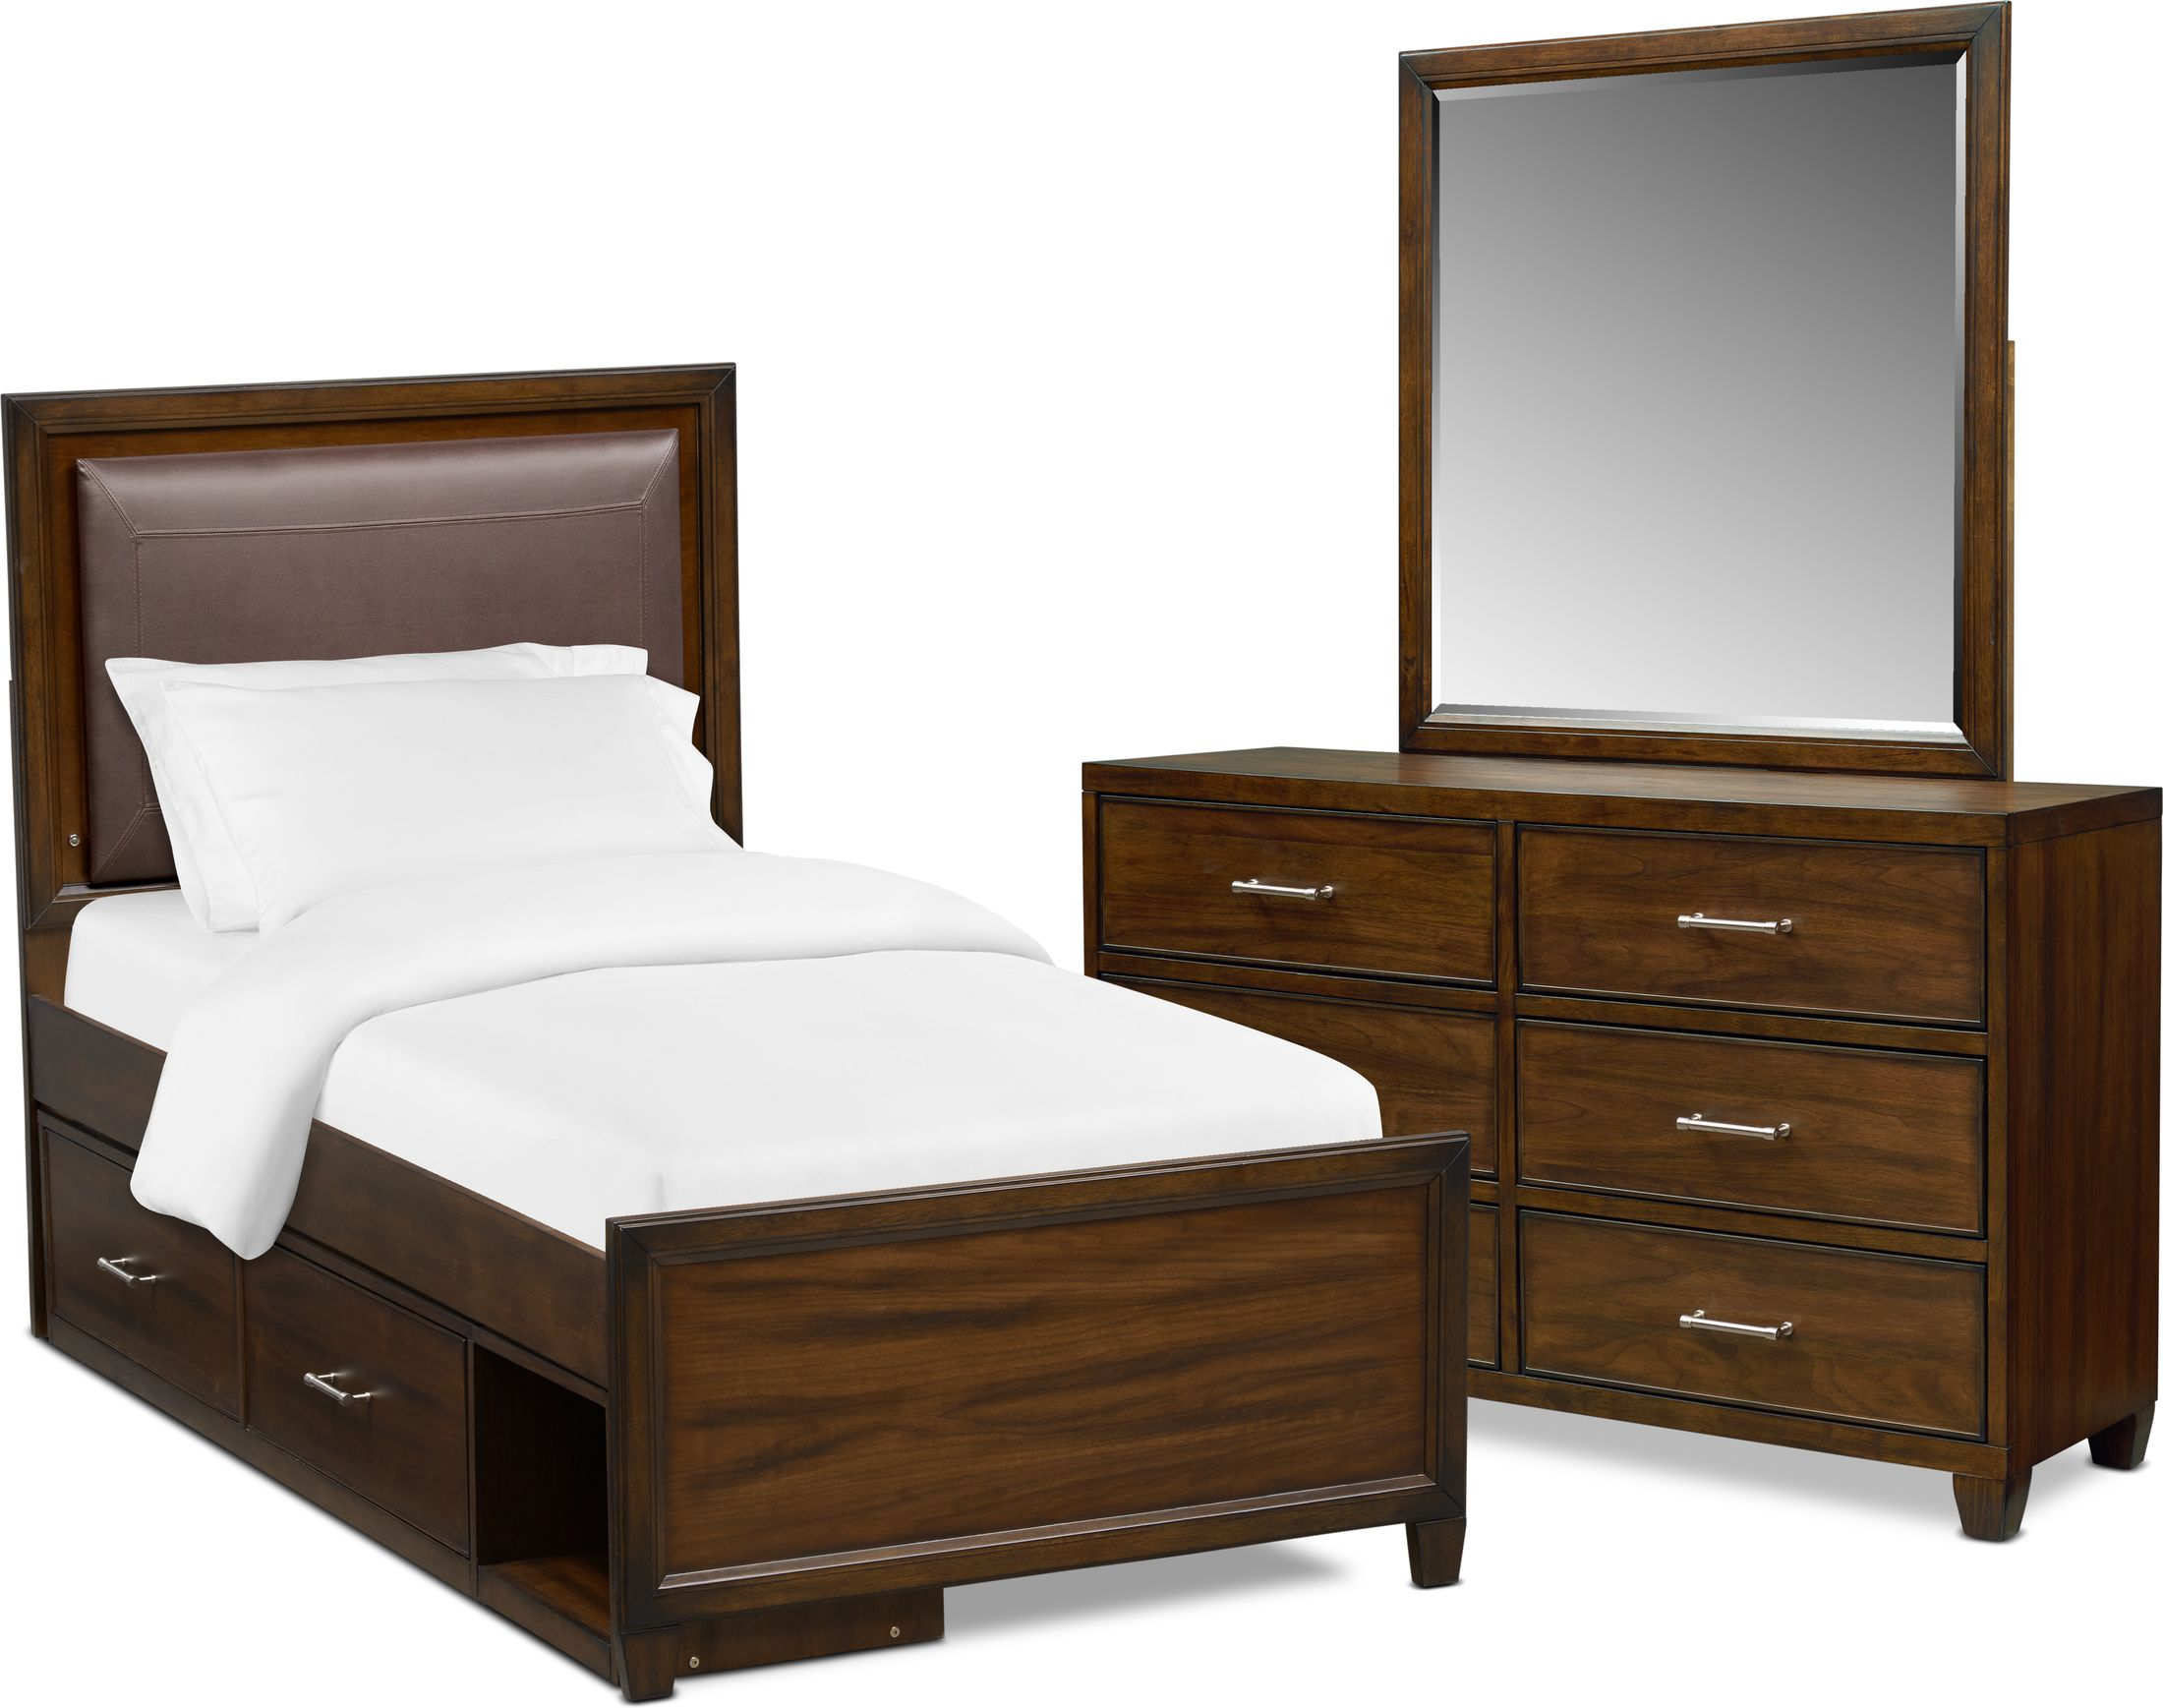 Bedroom Furniture - Sullivan 5-Piece Upholstered Storage Bedroom Set with Dresser and Mirror